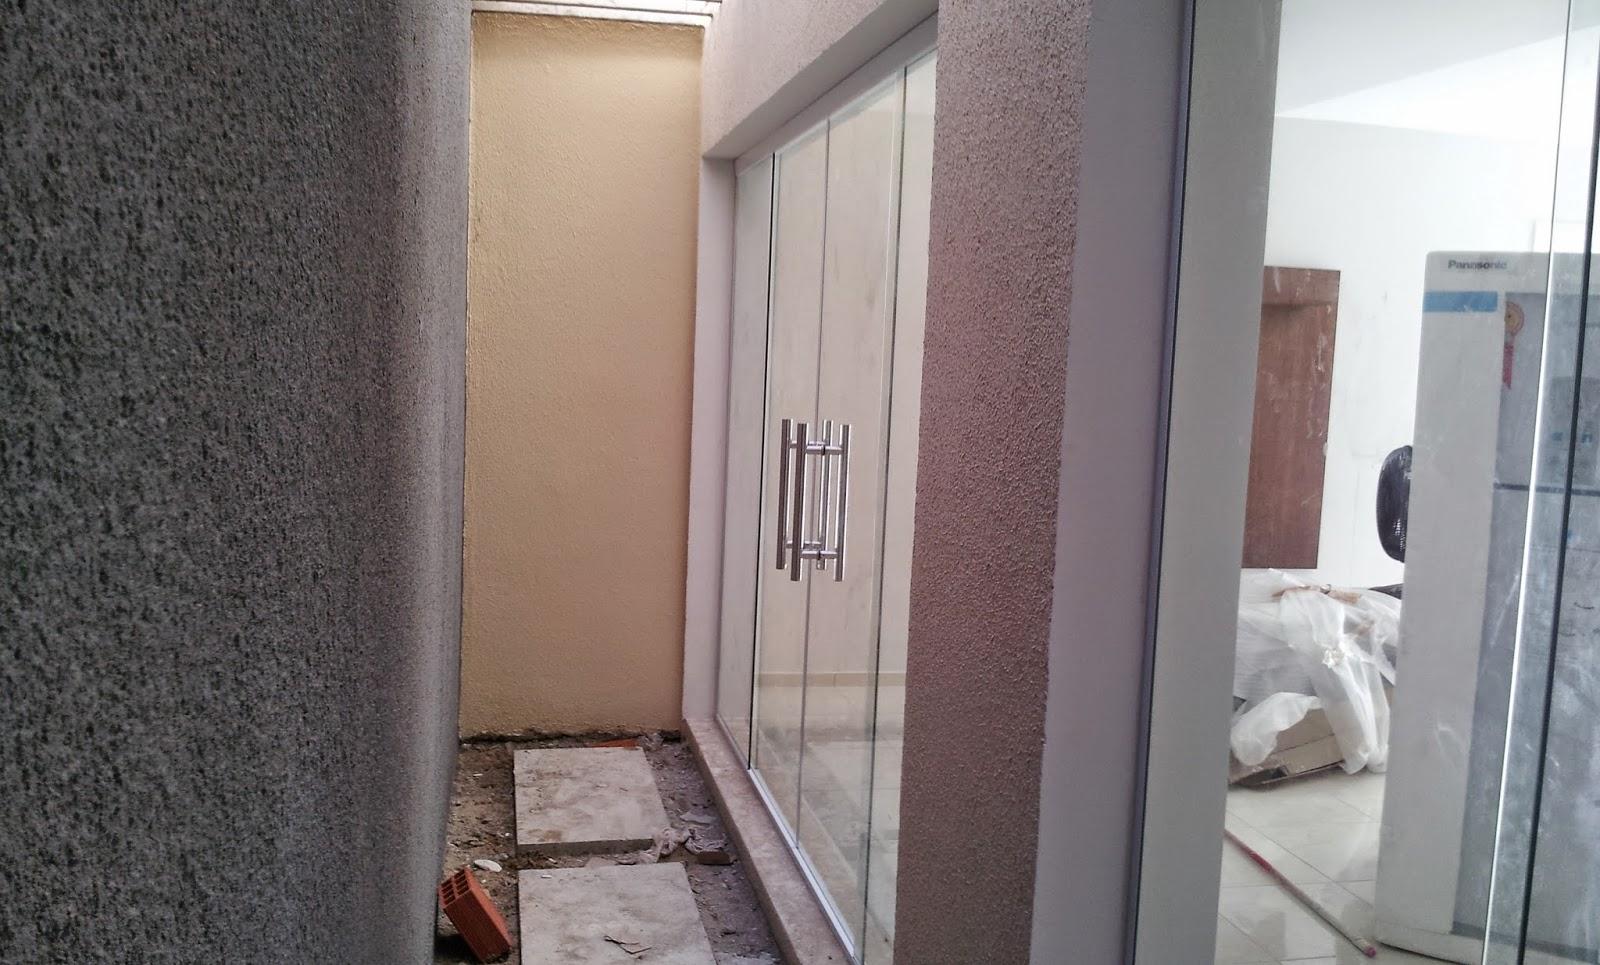 #7B6450  VIDRAÇARIA : JANELA E PORTA M 2000 DE VIDRO TEMPERADO EM FORTALEZA 414 Janelas De Vidros Em Fortaleza